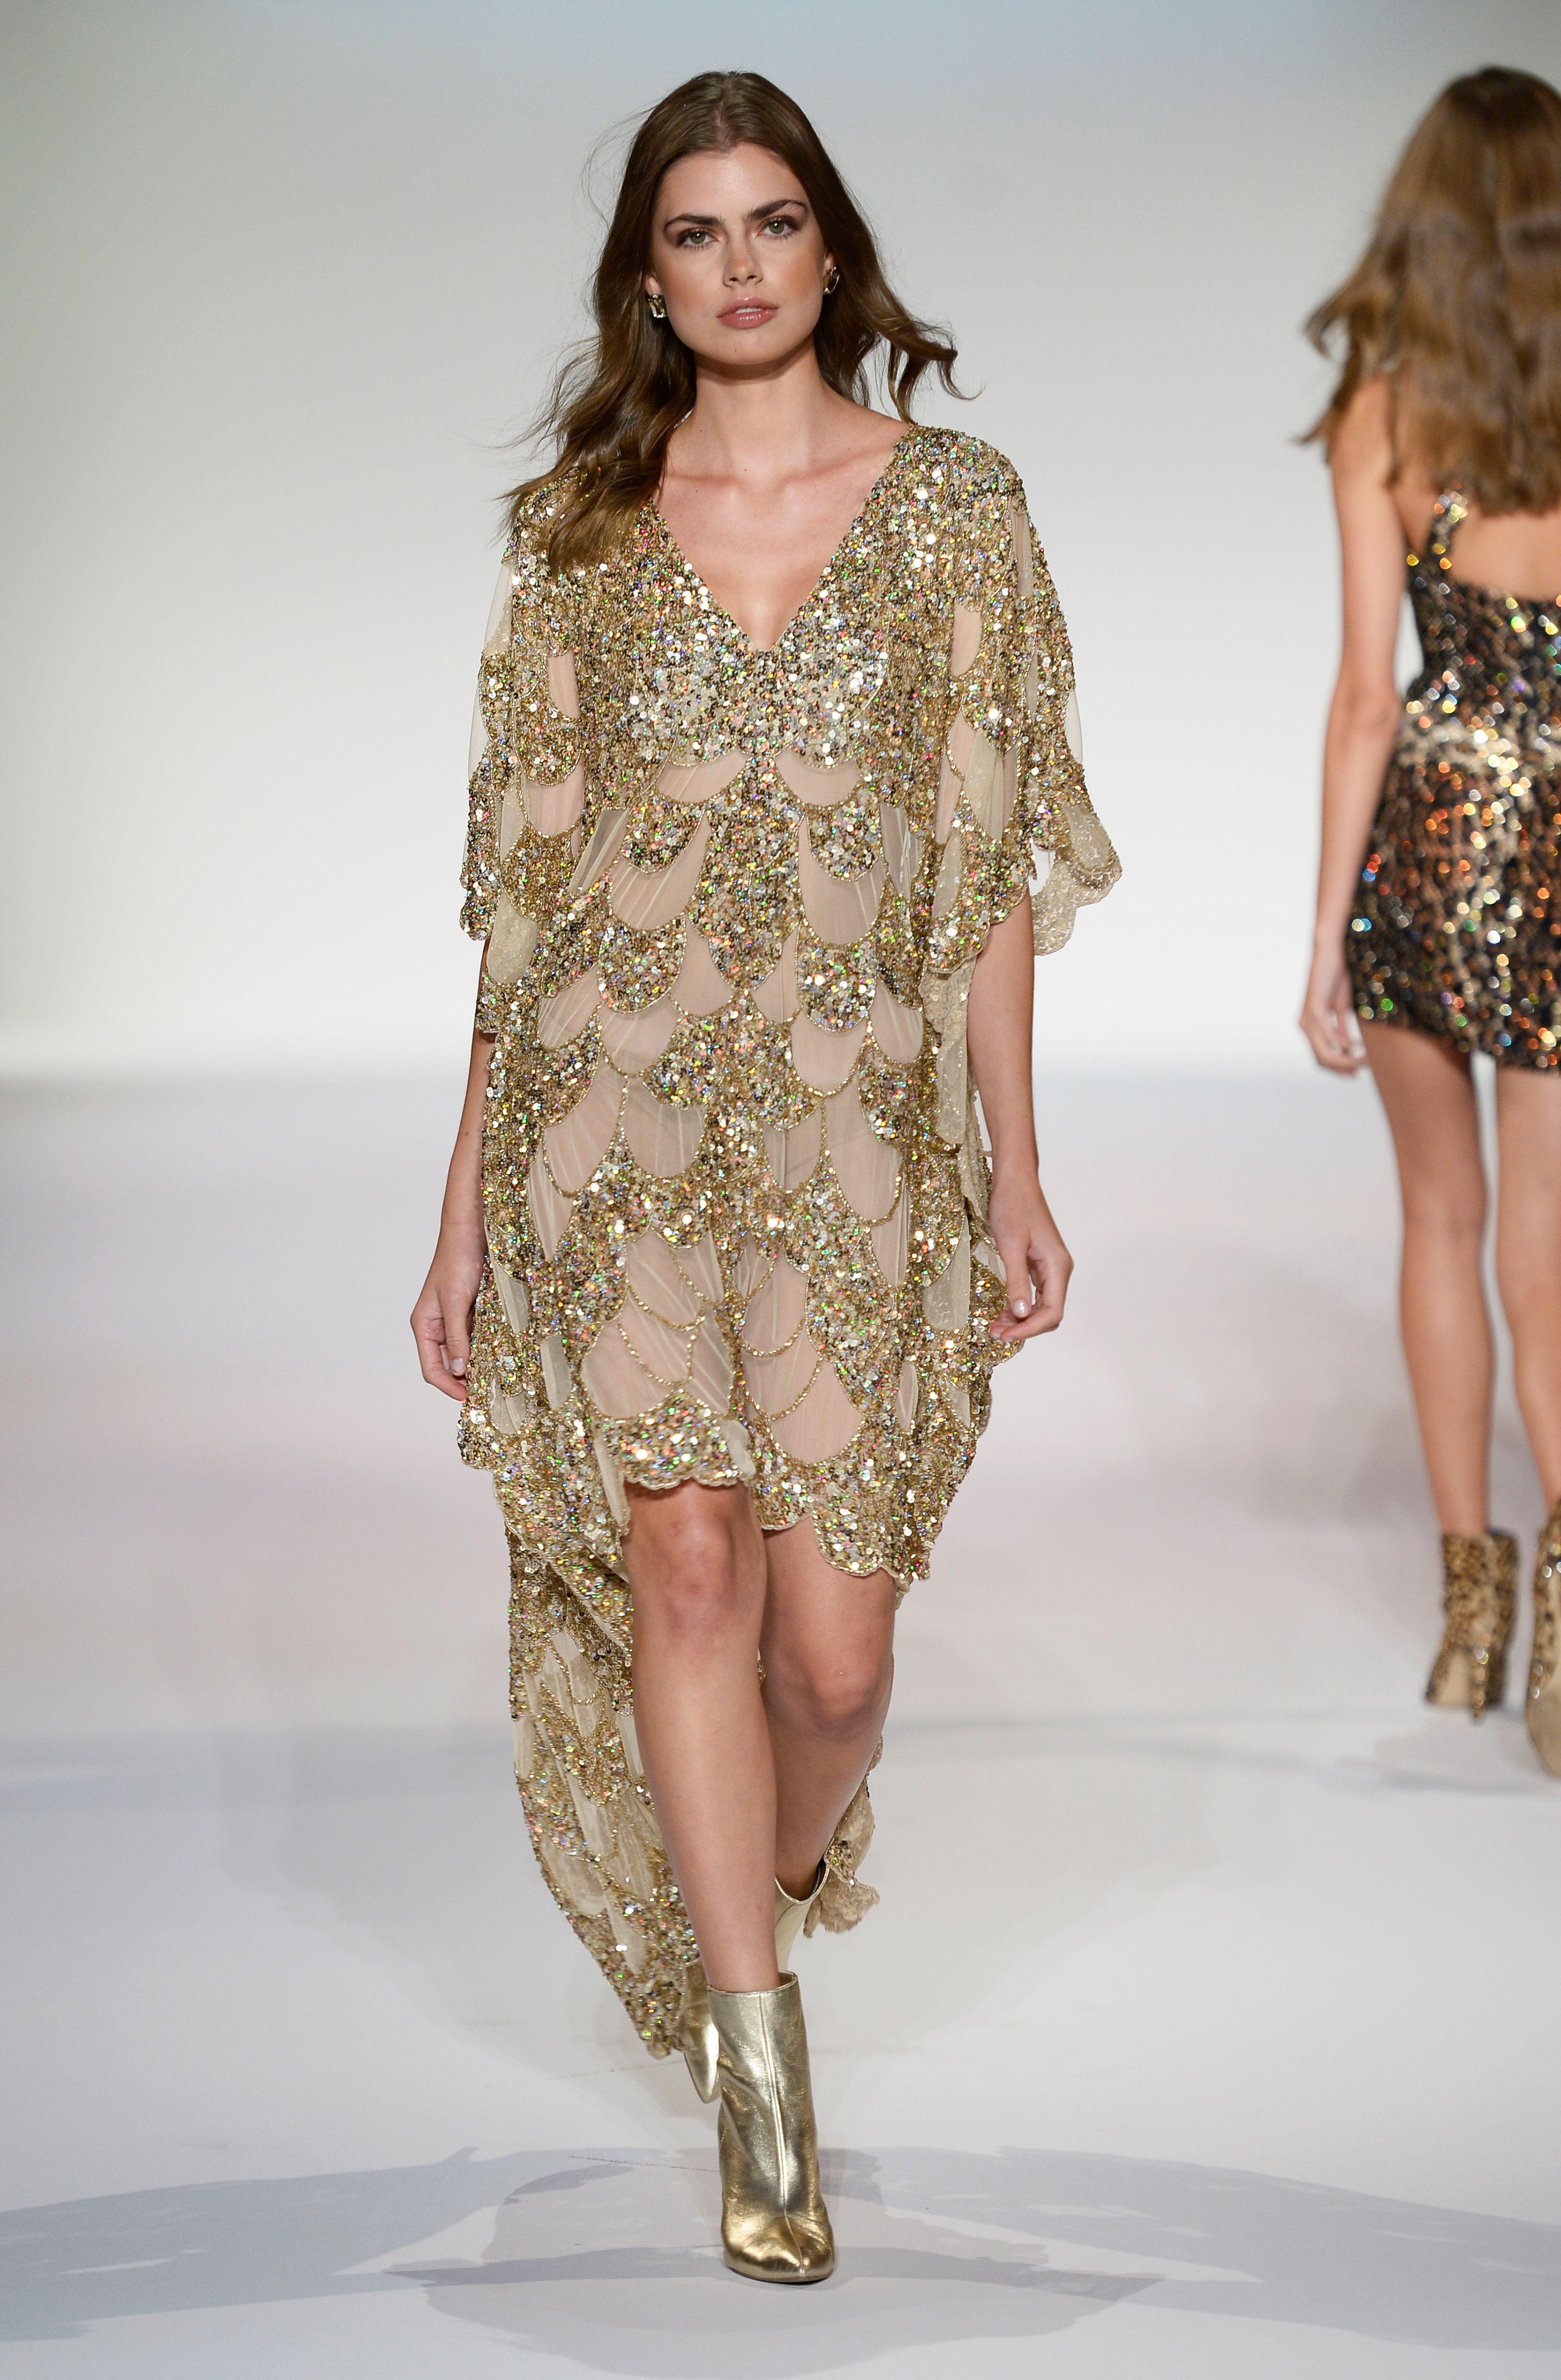 Nyc Fashion Week 2020.New York City Fashion Week 2019 Sherri Hill Spring 2020